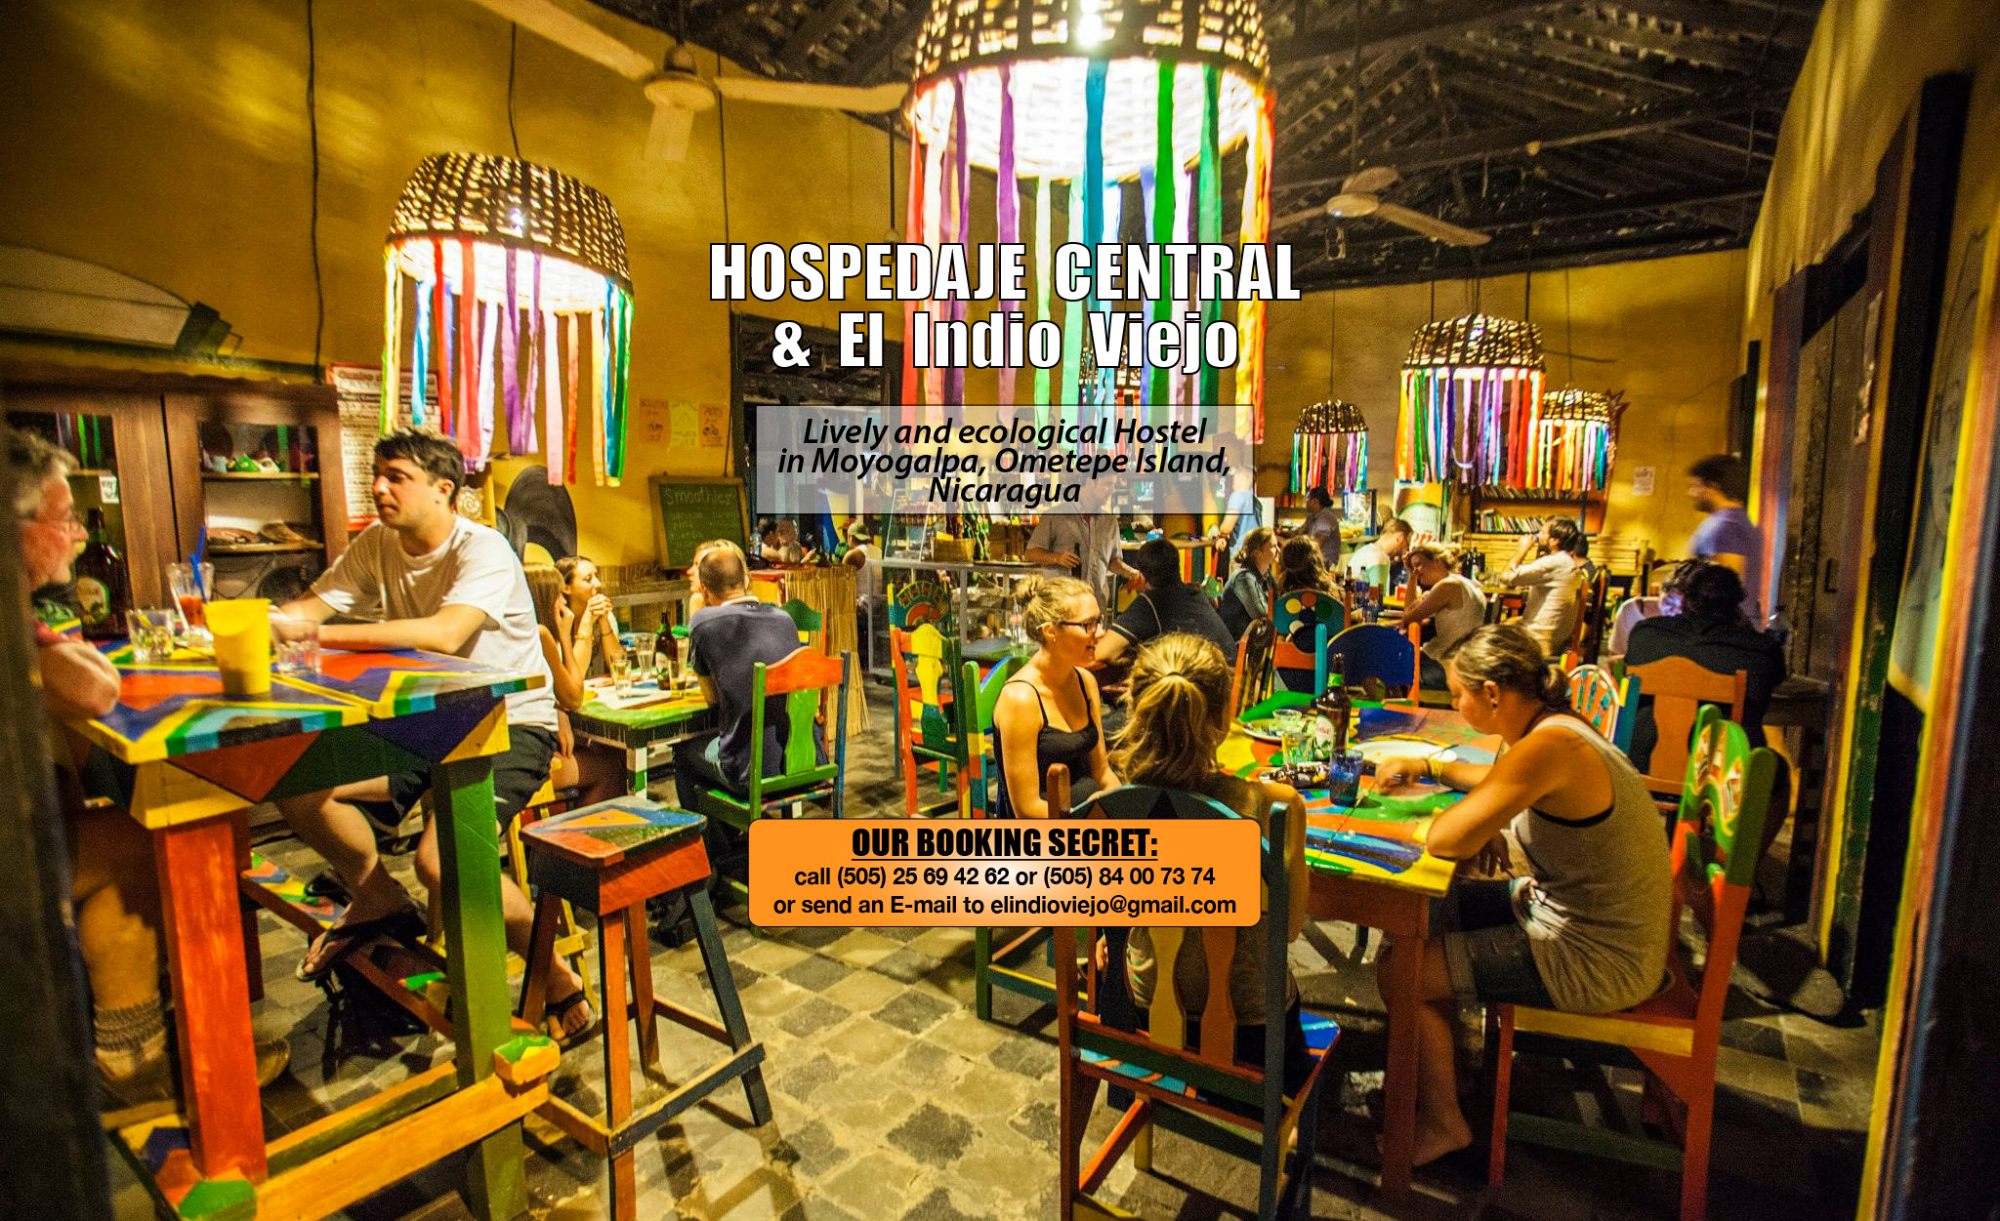 Hostel Ometepe Nicaragua - Hospedaje Central El Indio Viejo